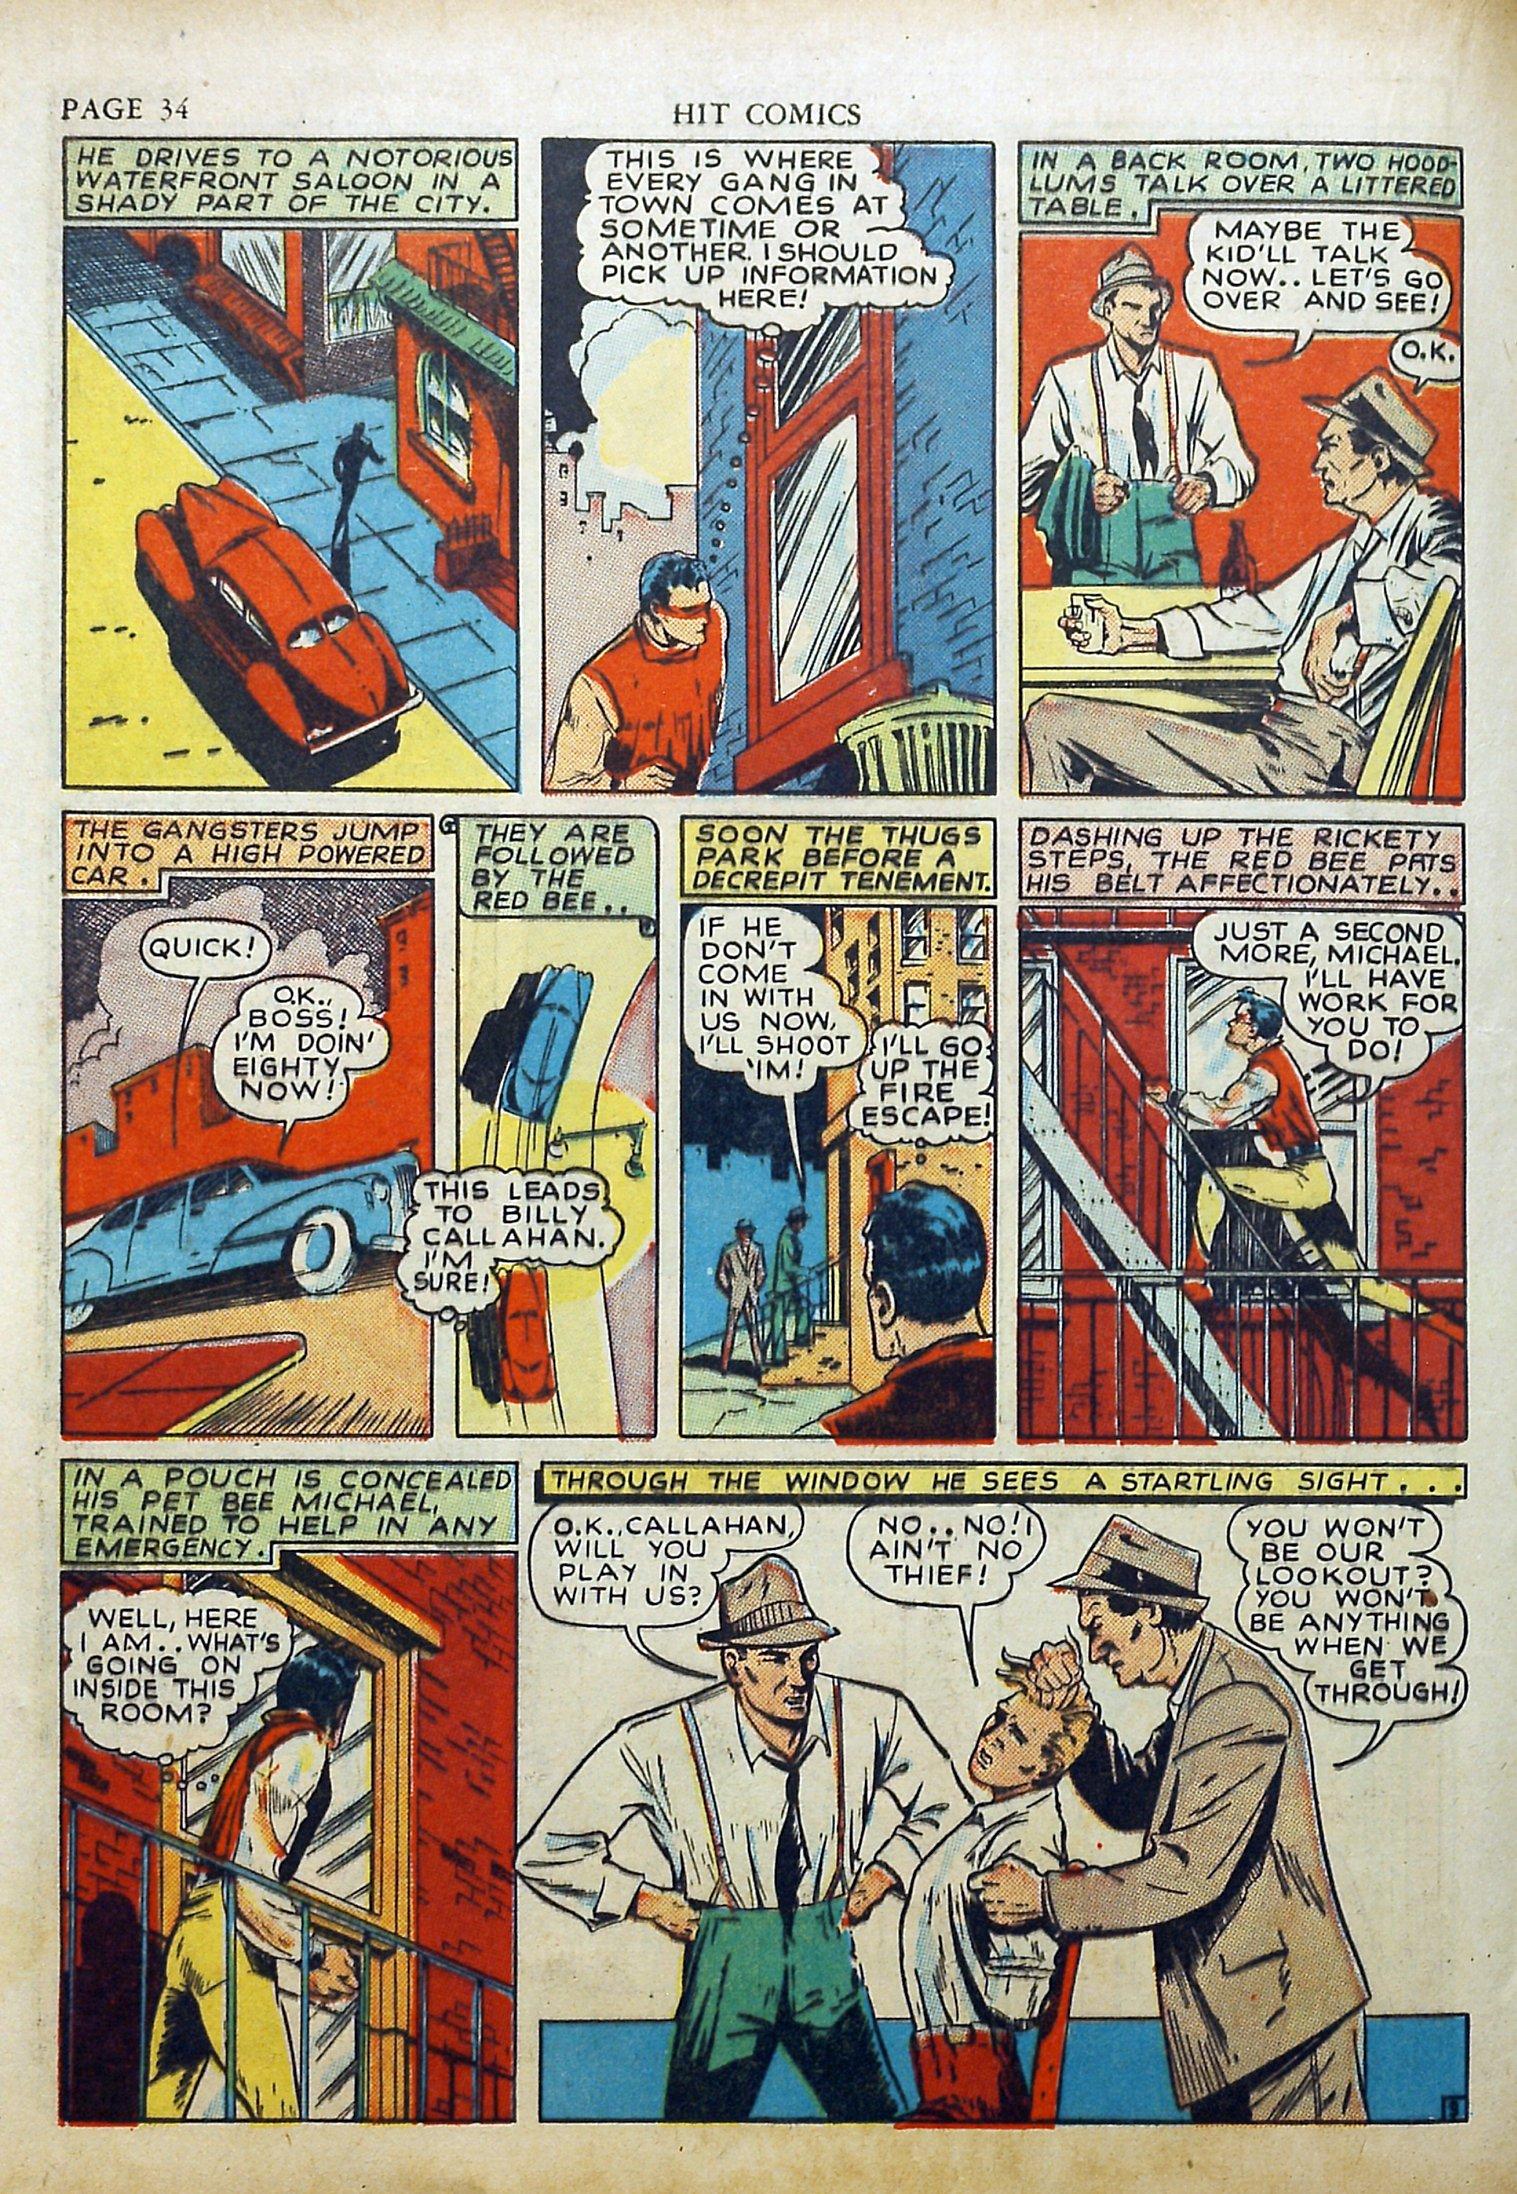 Read online Hit Comics comic -  Issue #17 - 36